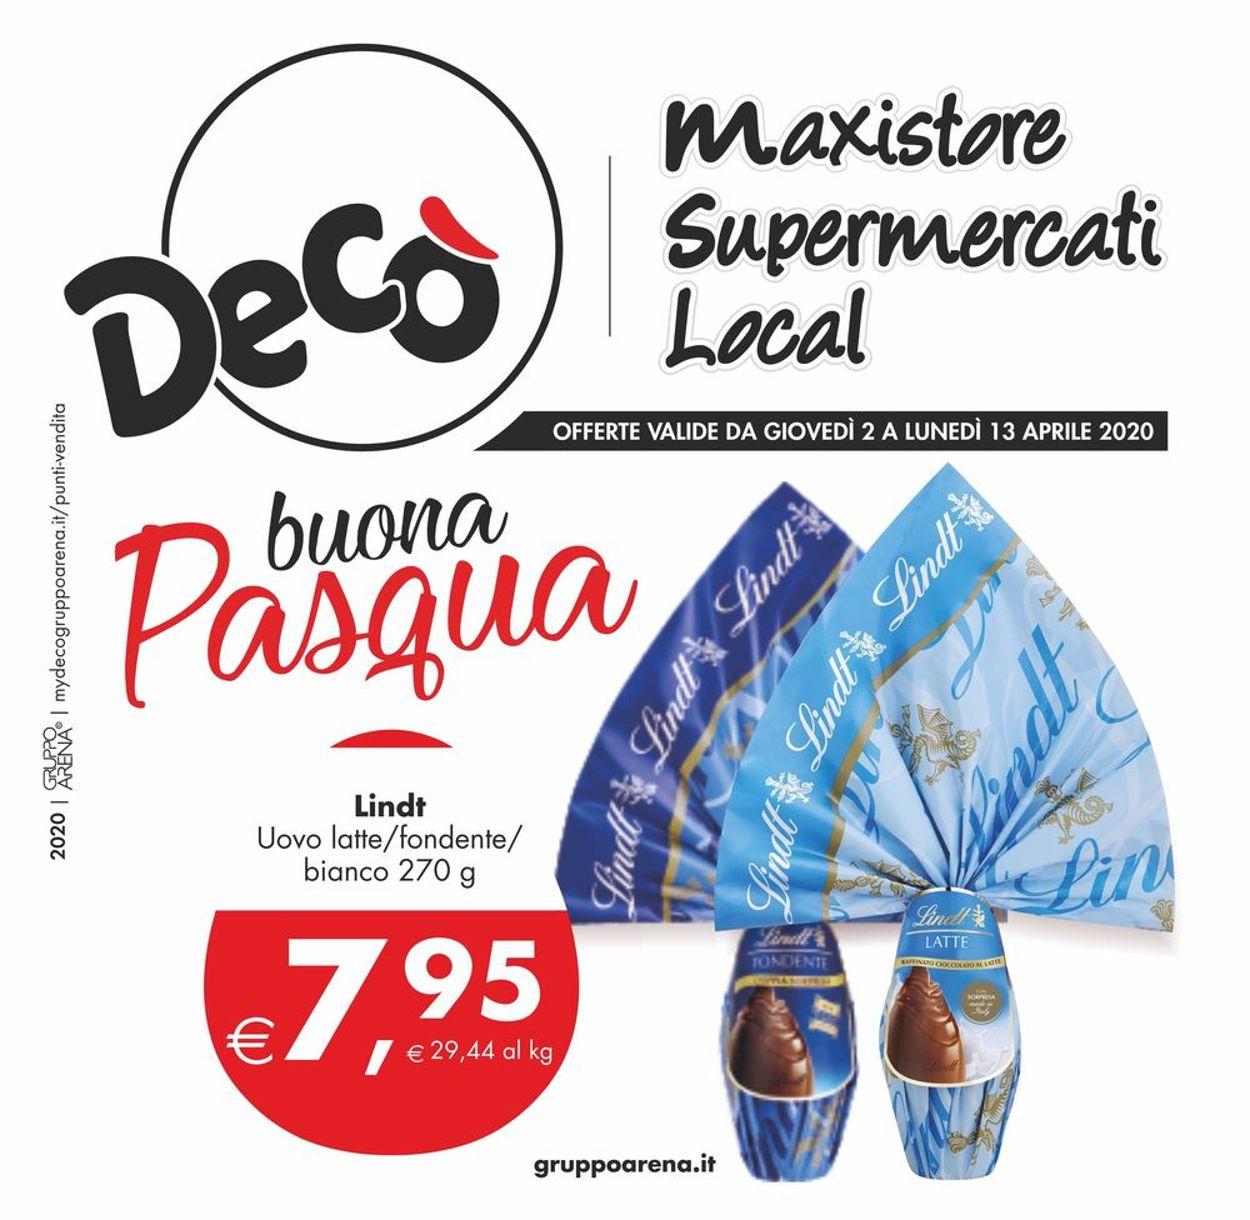 Volantino Deco - Offerte 02/04-13/04/2020